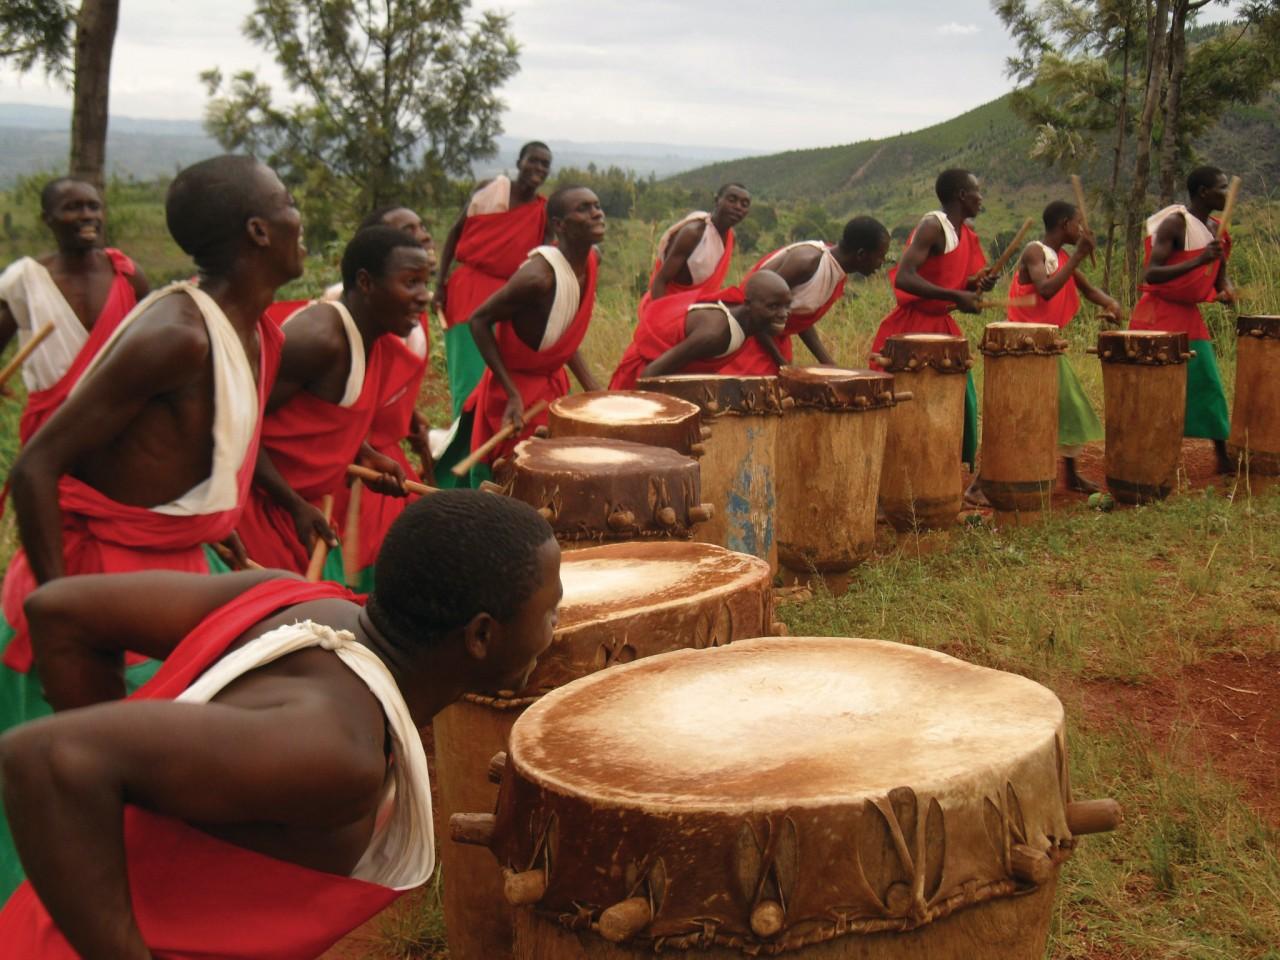 Les tambourinaires de Gishora. (© Julia GASQUET))